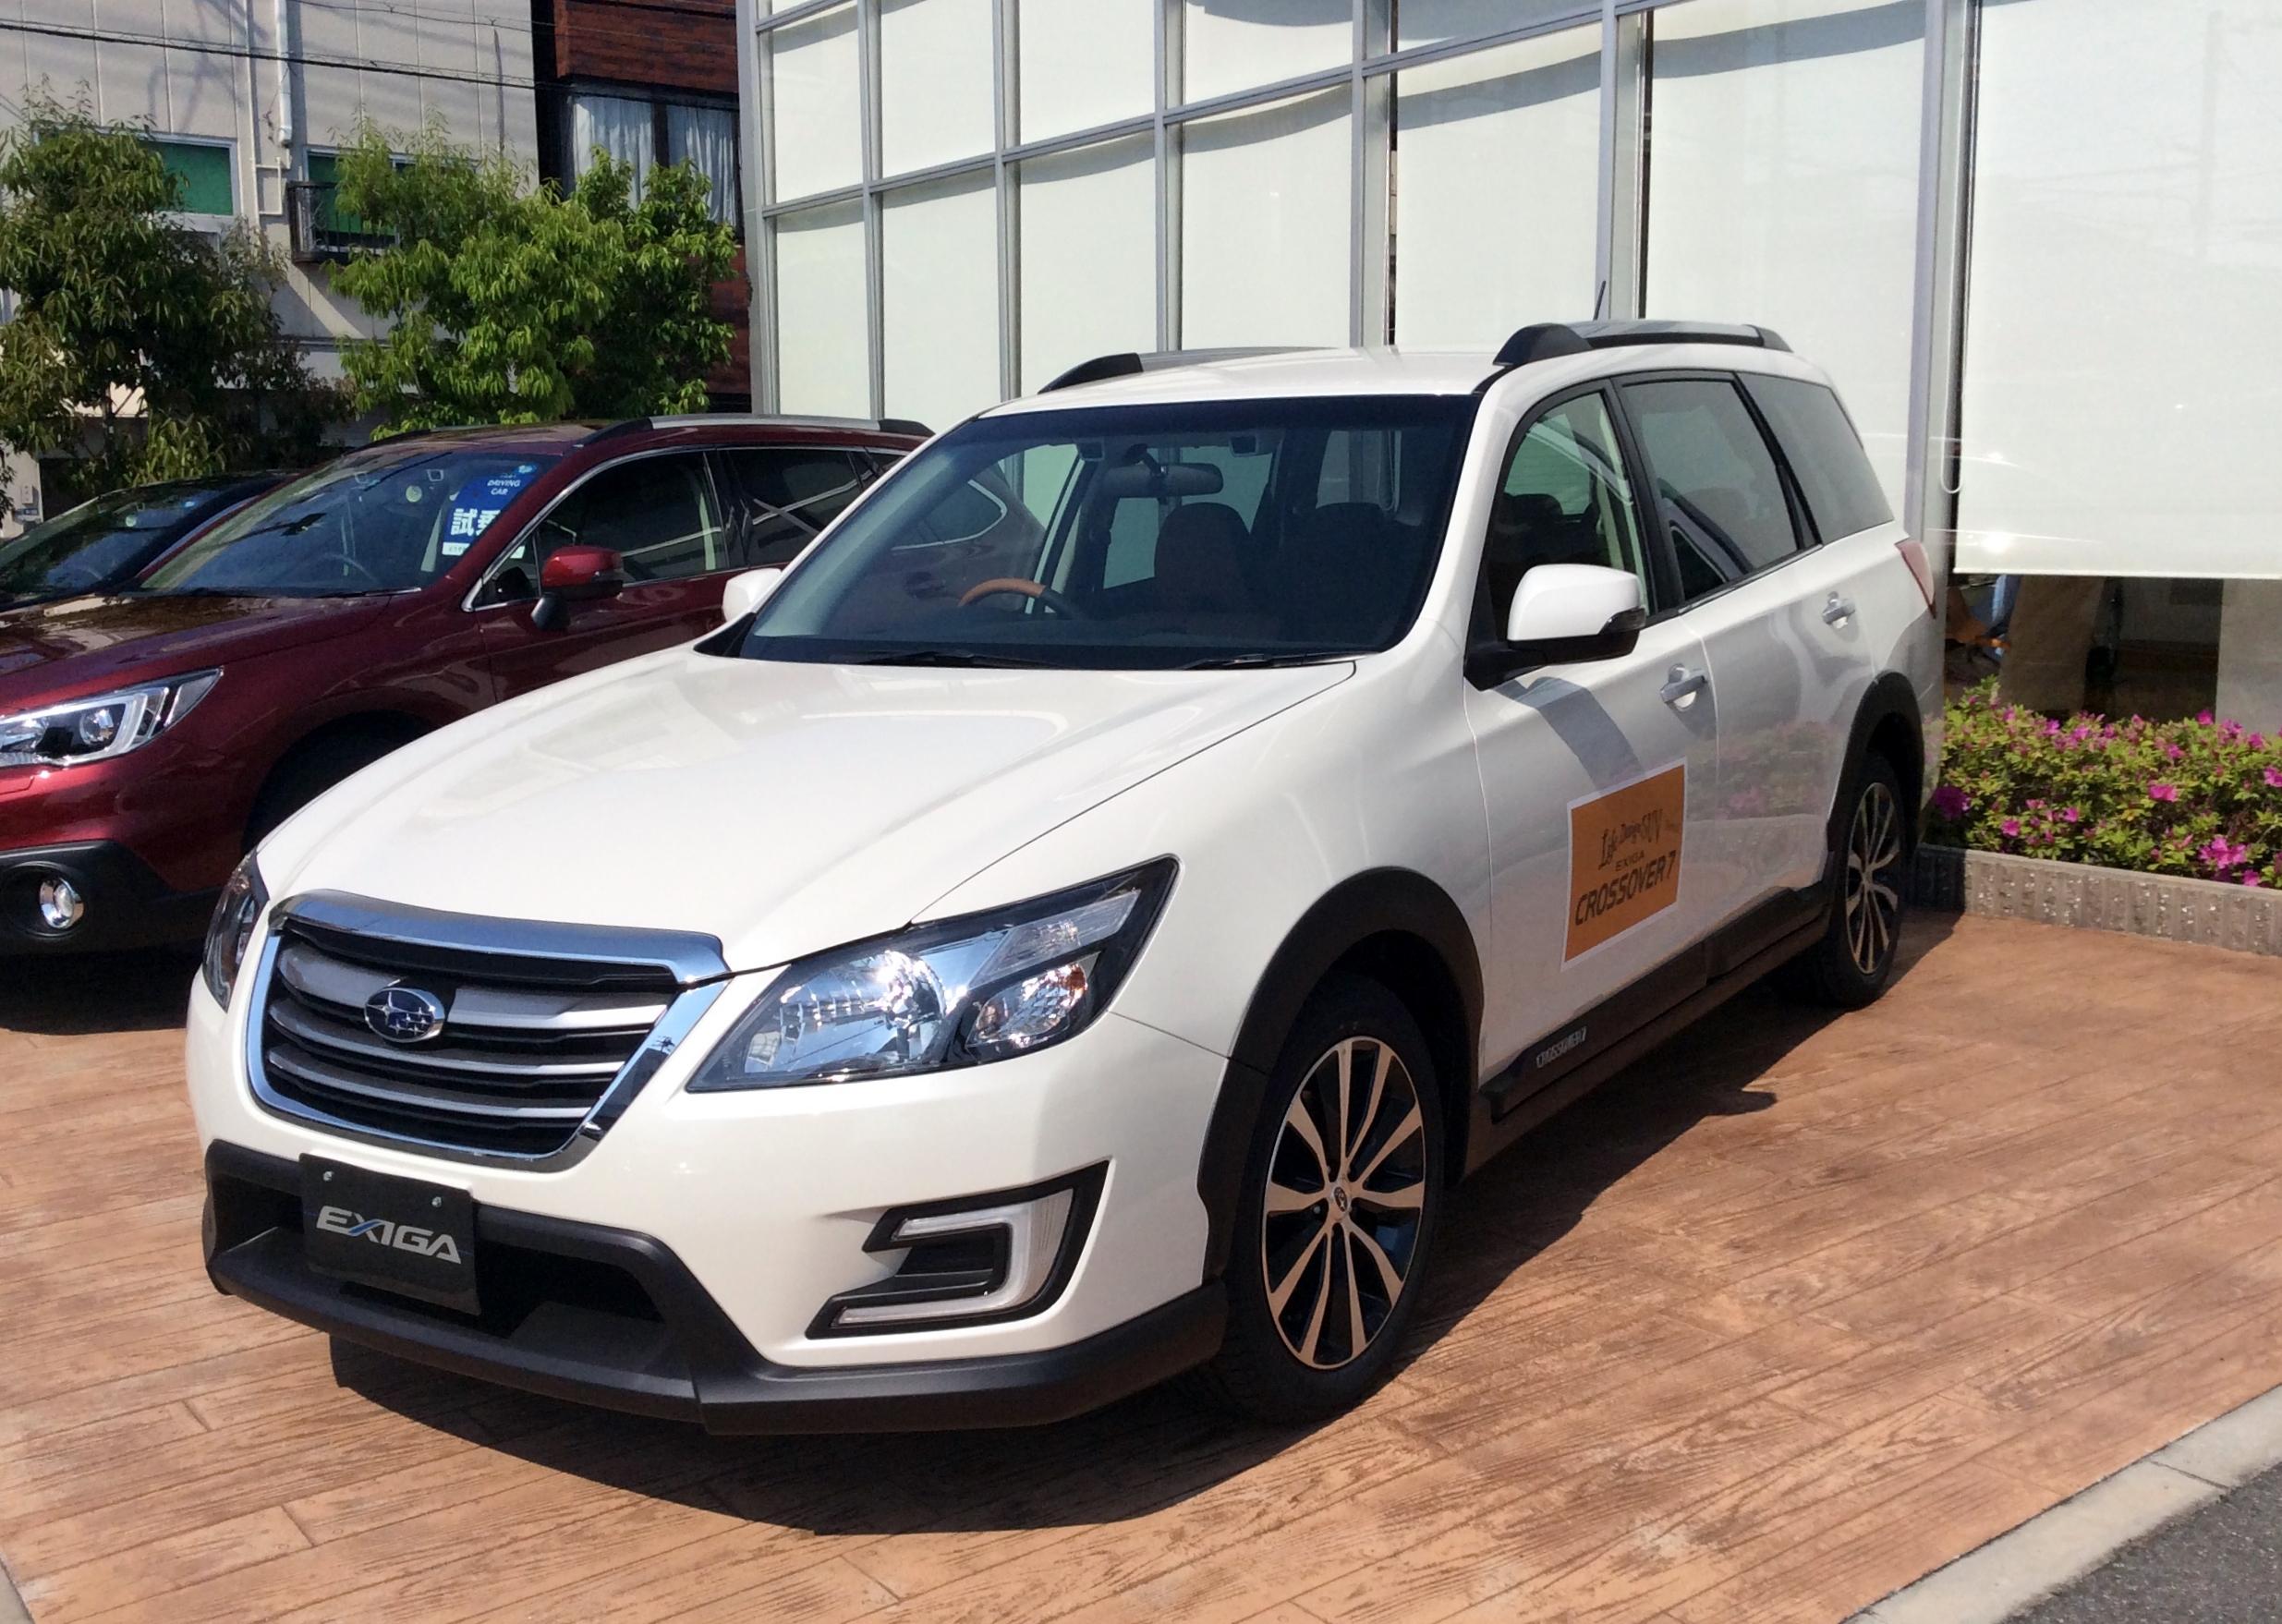 Subaru 8 Seater >> File:Subaru EXIGA CROSSOVER 7 (YAM) front.JPG